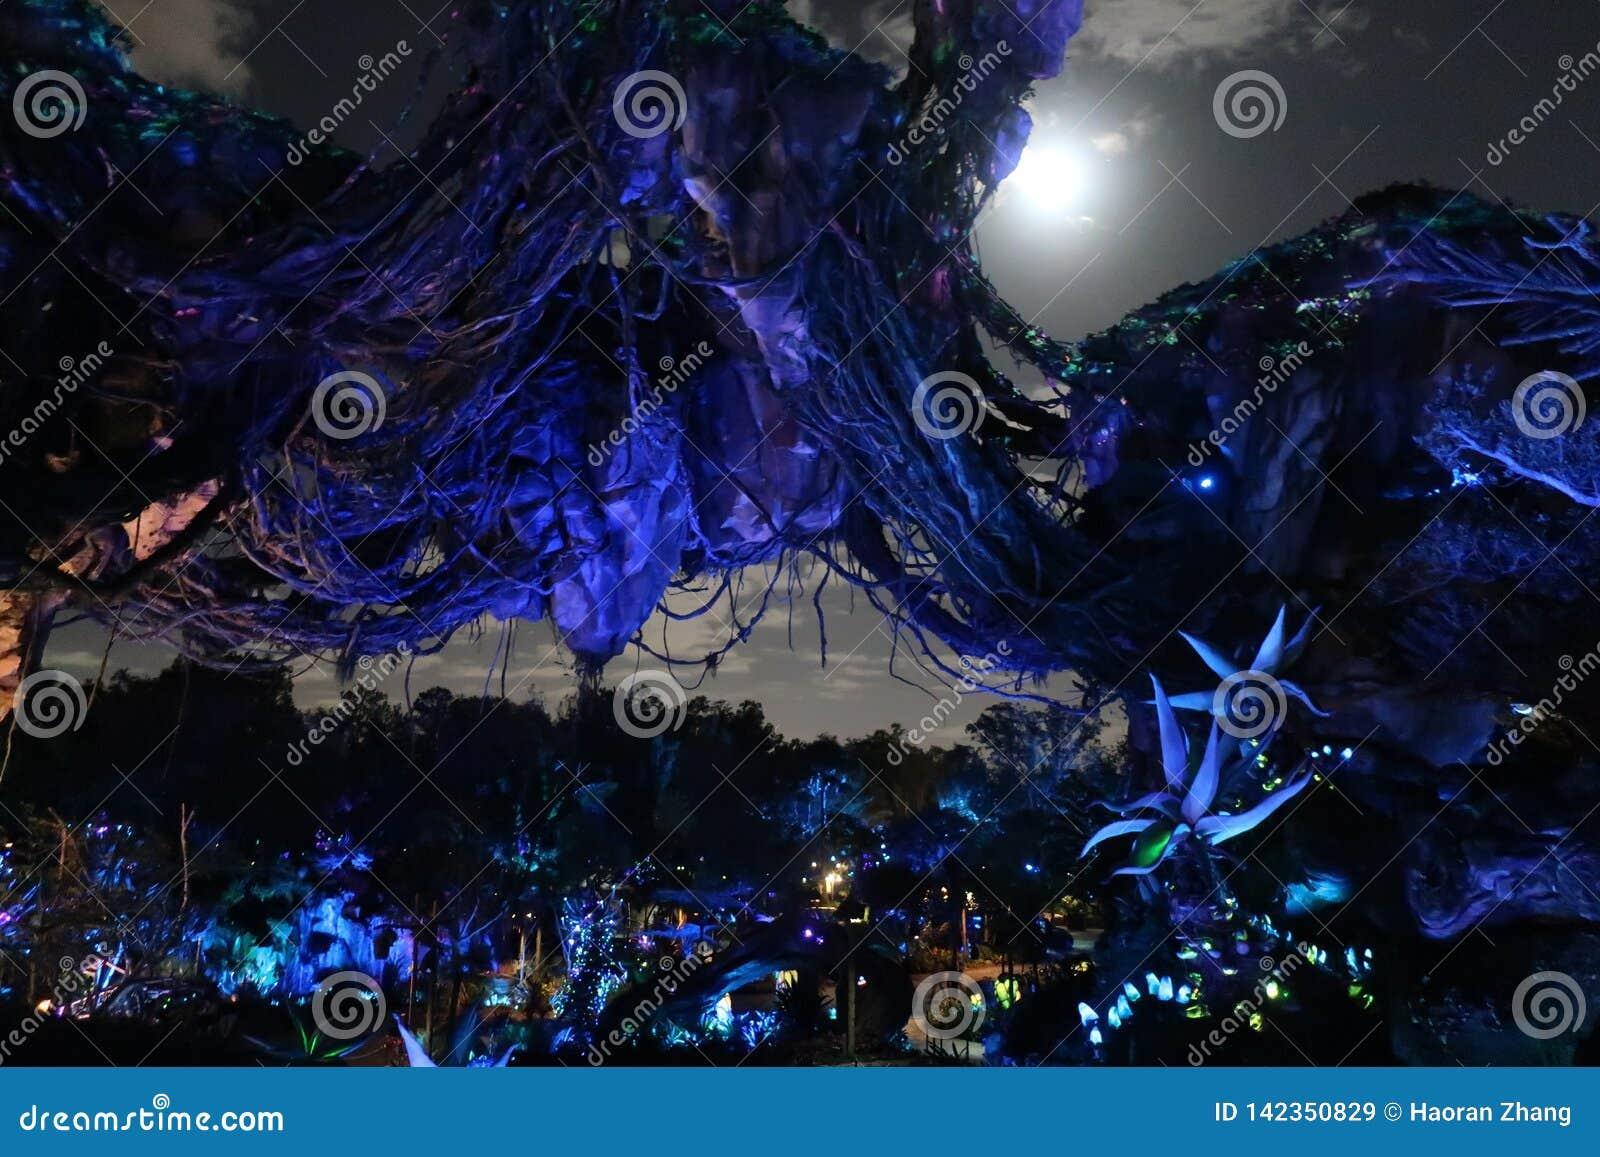 Pandora The World Of Avatar At Walt Disney